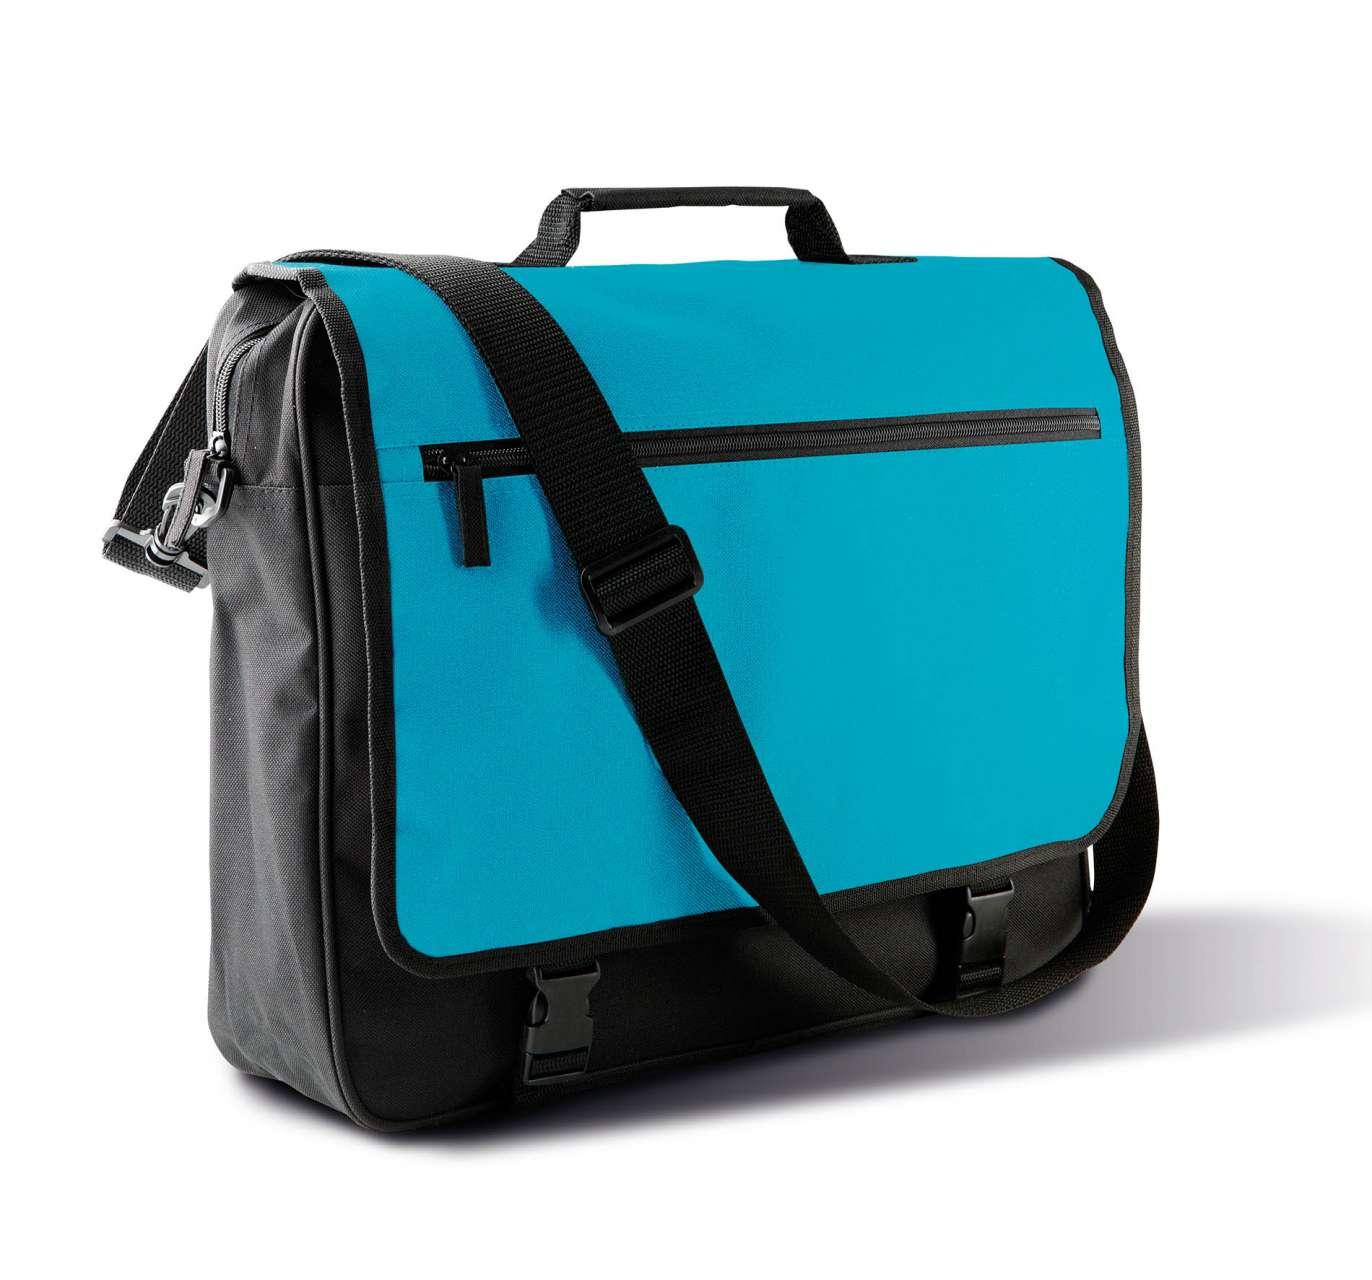 Geanta KI0412 negru turquoise Genti rucsacuri personalizate conferinta laptop sport compartiment serigrafie broderie termotransfer